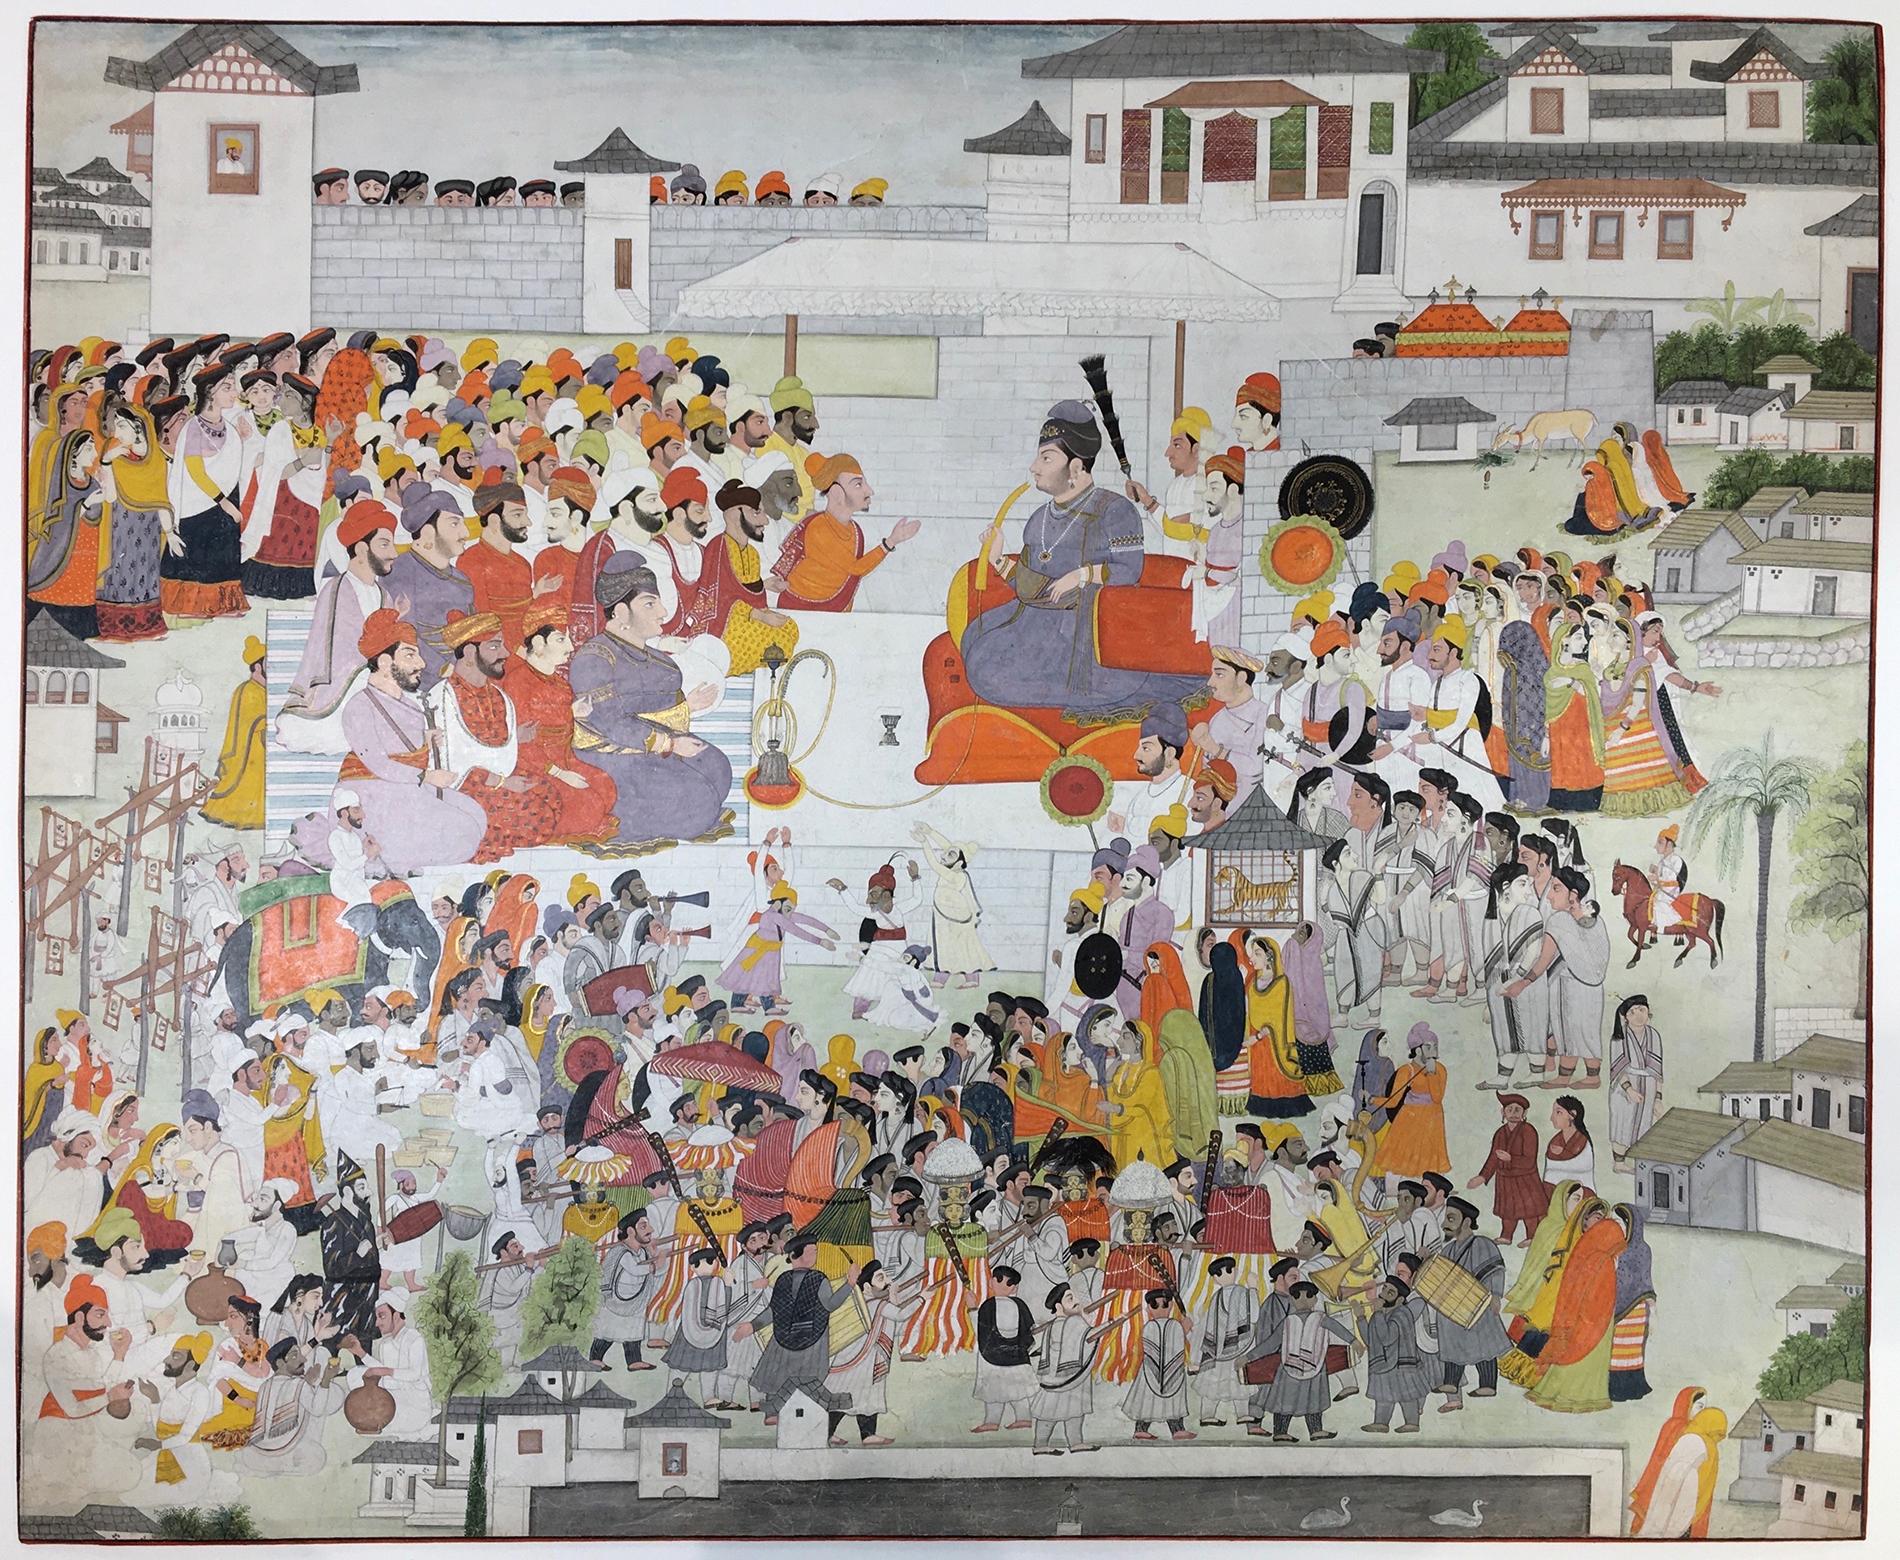 MAHARAJA ISHWARI SEN OF MANDI CELEBRATES THE SHIVARATRI FESTIVAL Mandi, India Opaque Pigment on paper 1807